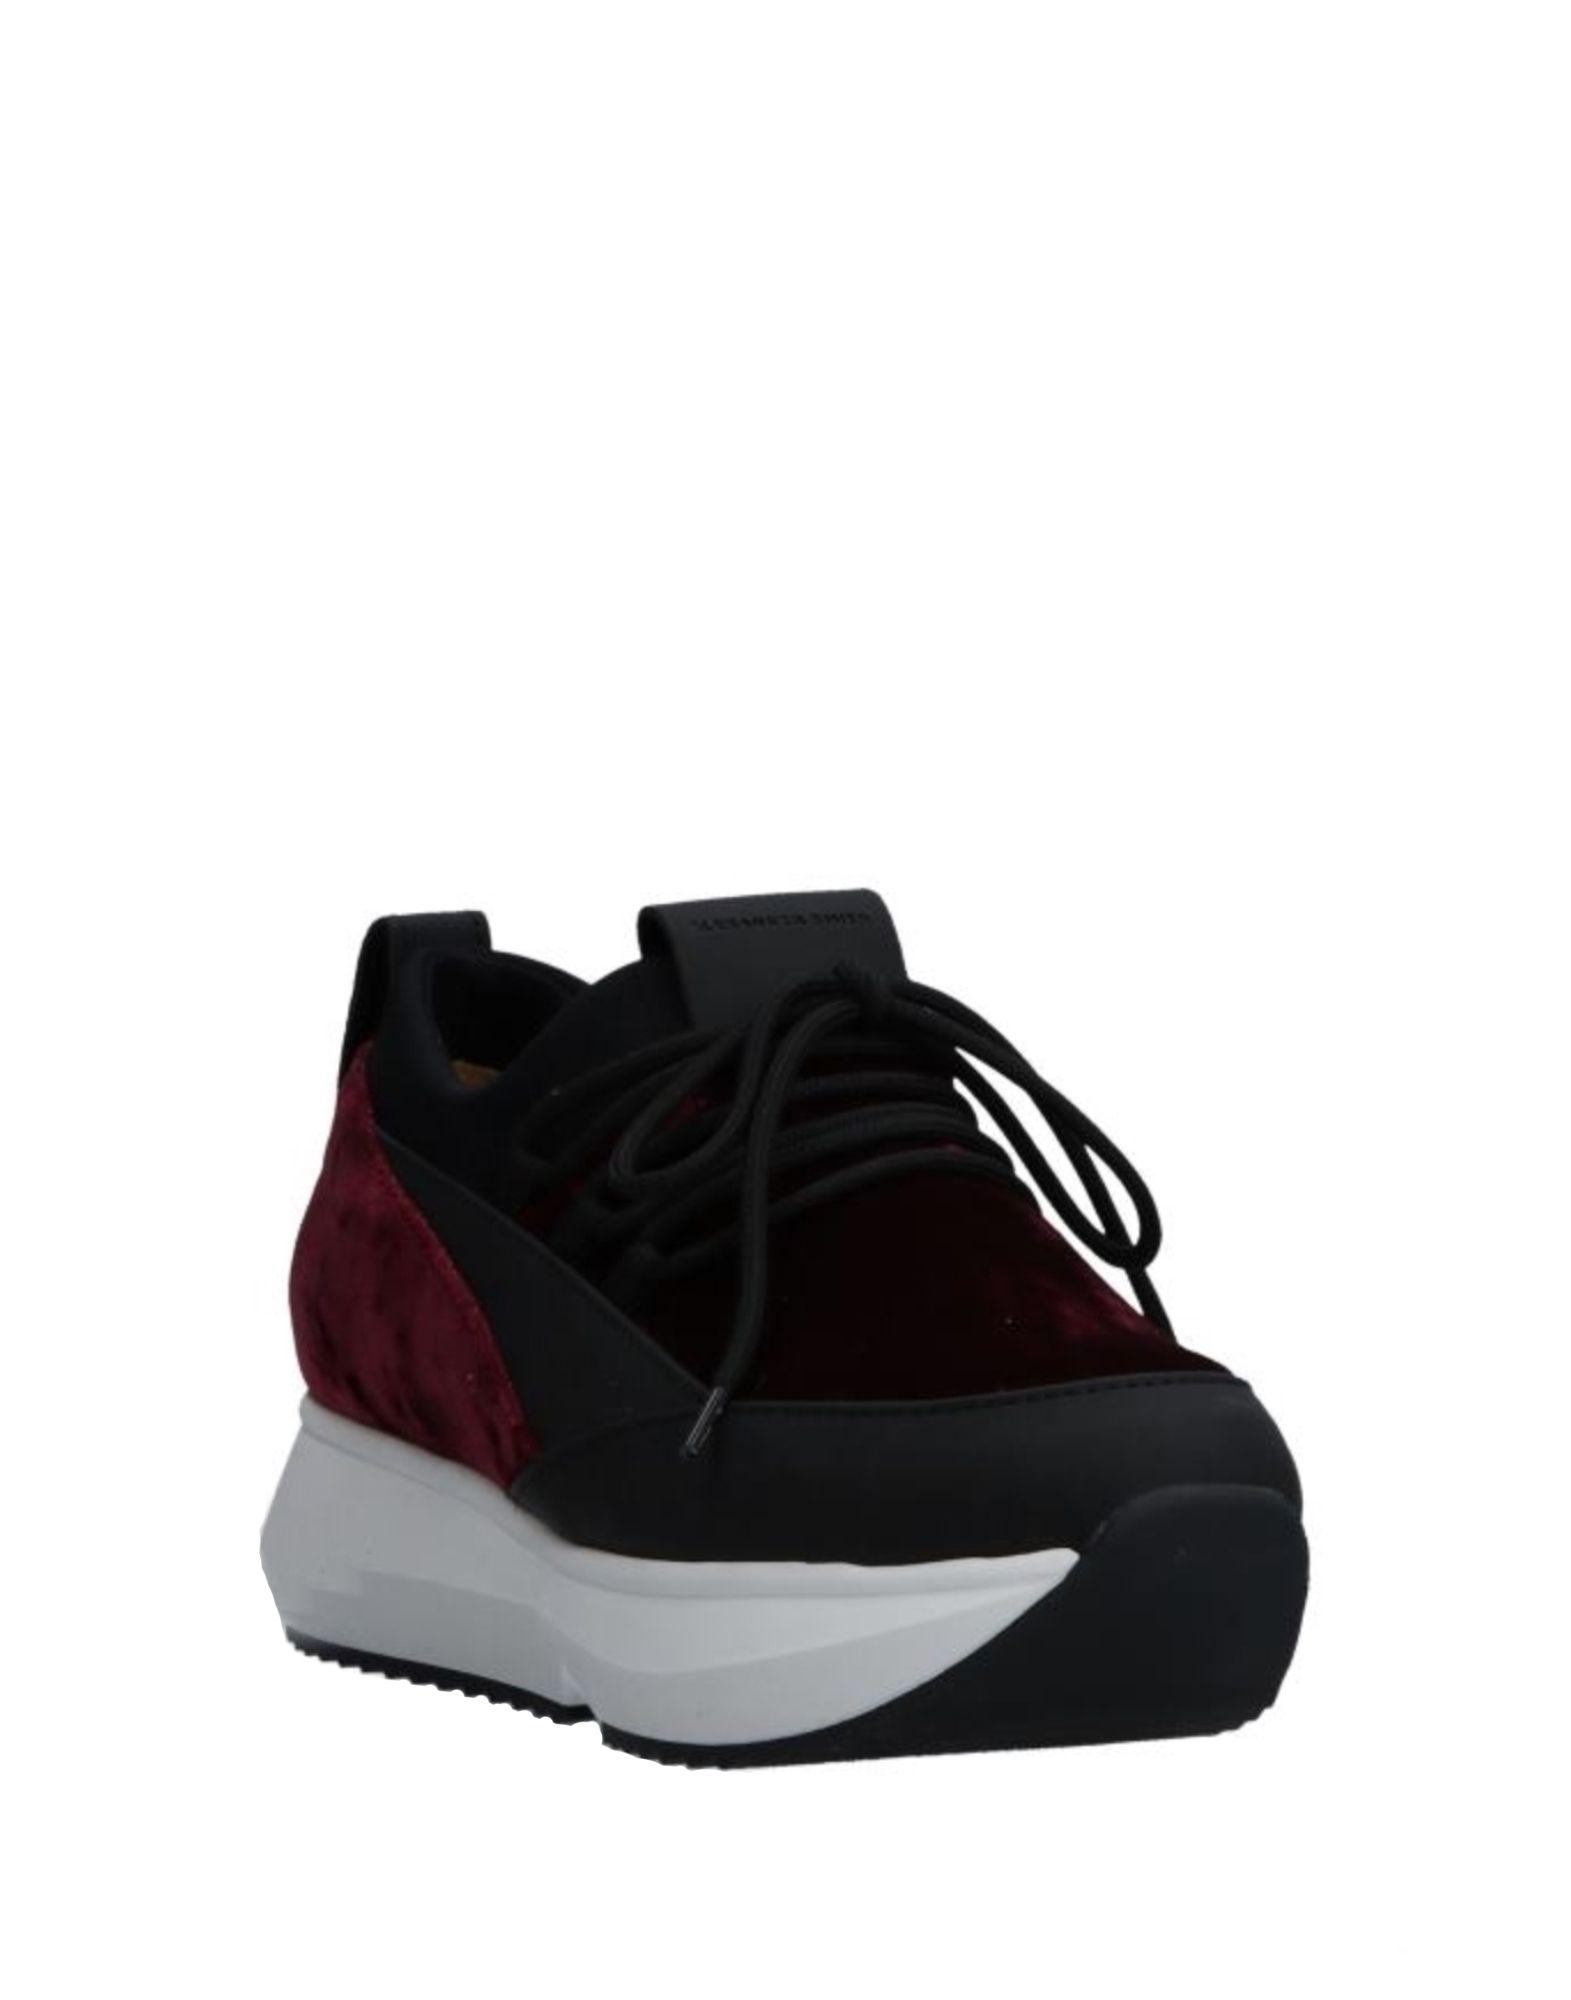 Alexander Smith Leather Low-tops & Sneakers in Maroon (Black)